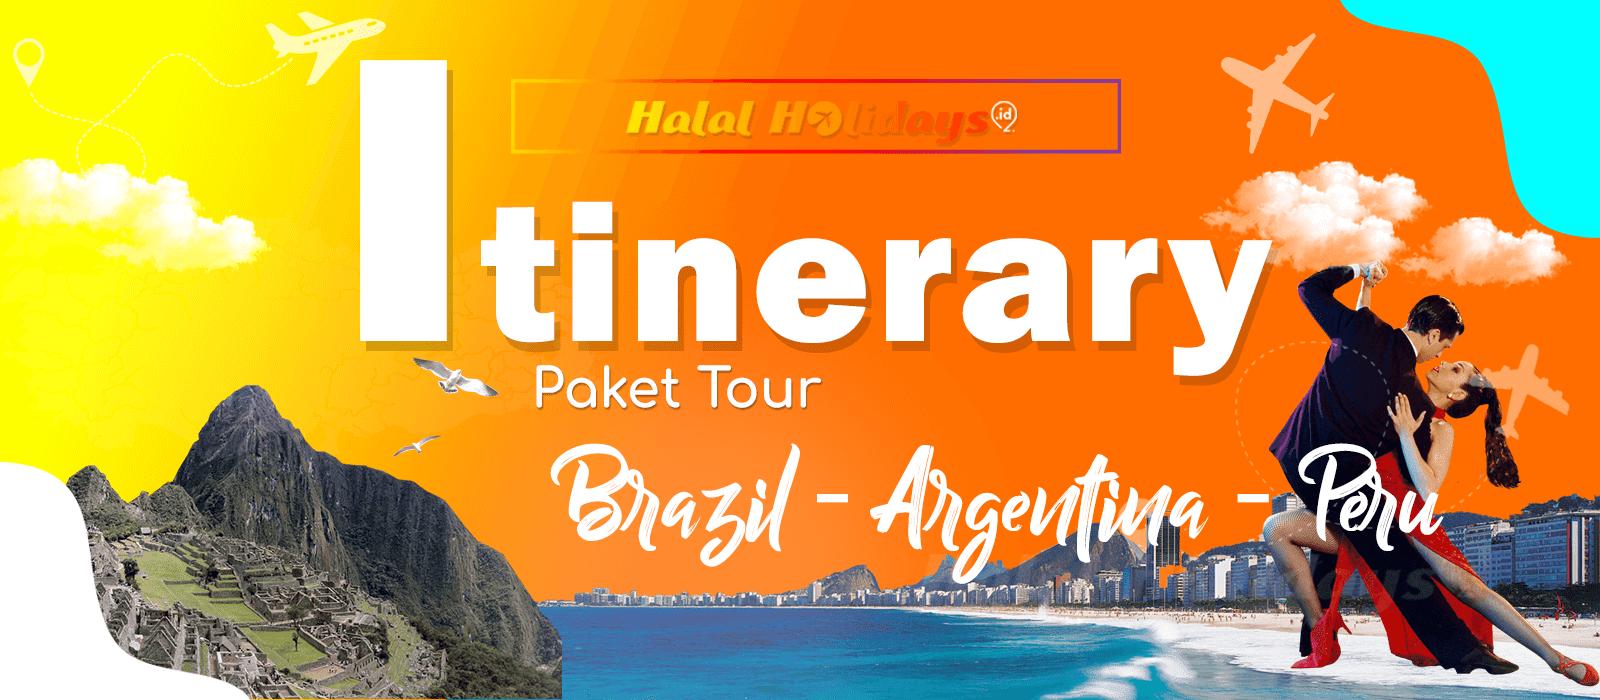 Itinerary Paket Tour Halal Argentina Brazil Peru 12 Hari